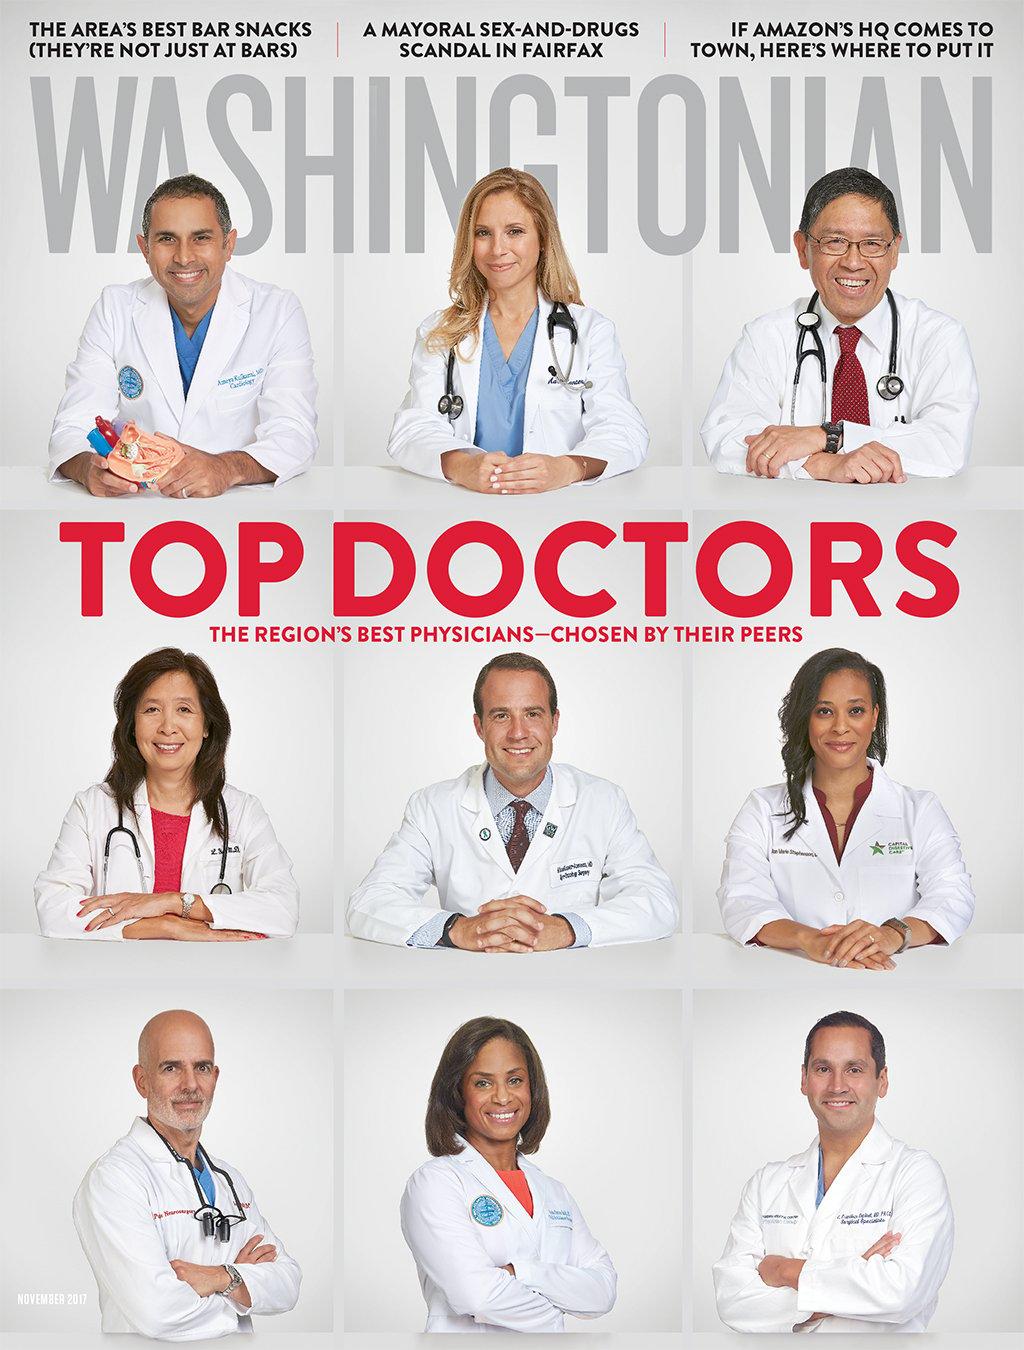 November 2017: Top Doctors | Washingtonian (DC)